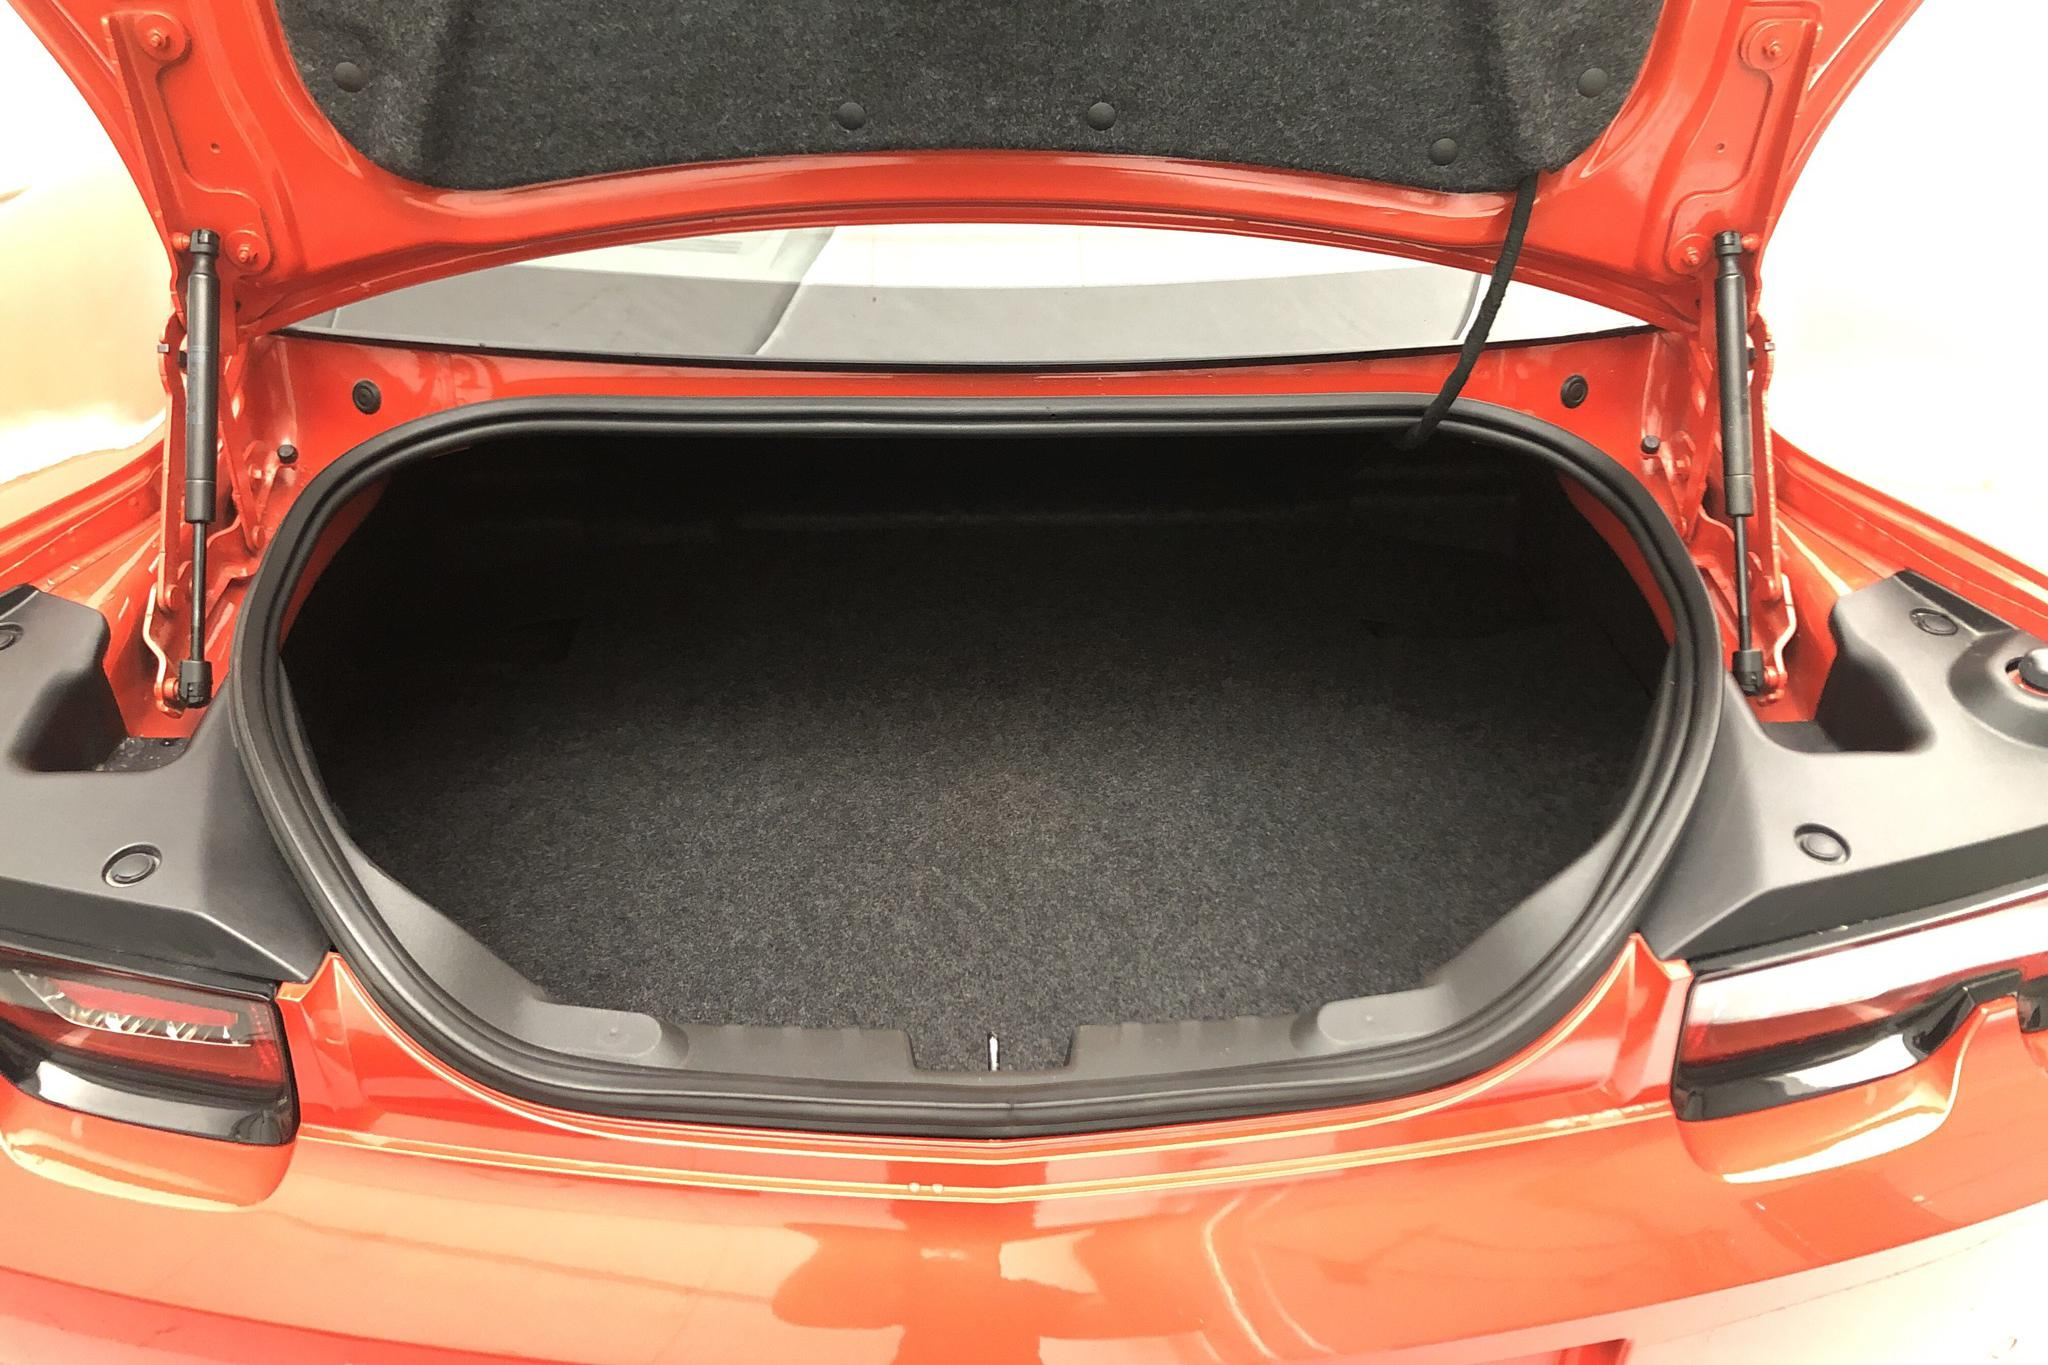 Chevrolet Camaro SS 6.2 V8 Coupé (432hk) - 2 887 mil - Manuell - orange - 2013